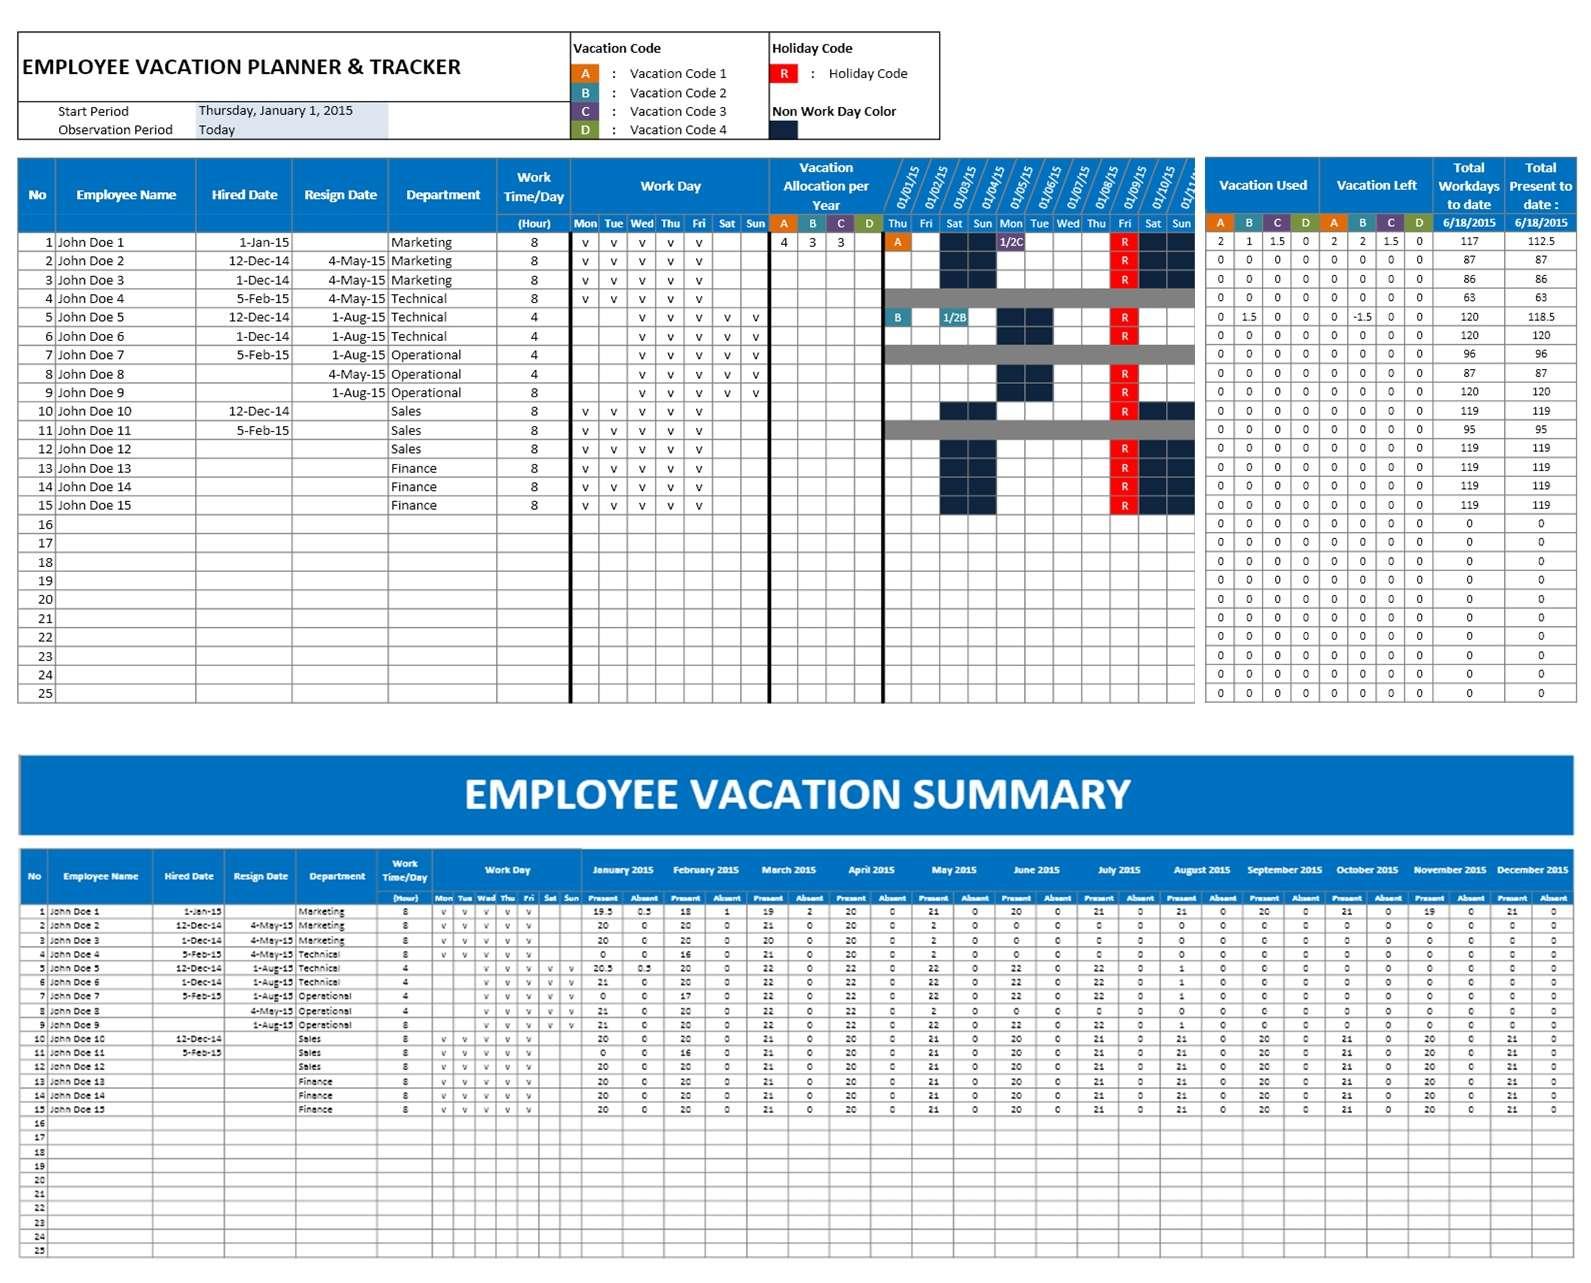 Excel Vacation Calendar Template 2016 | Calendar Template 2019 for Staff Holiday Calendar Template